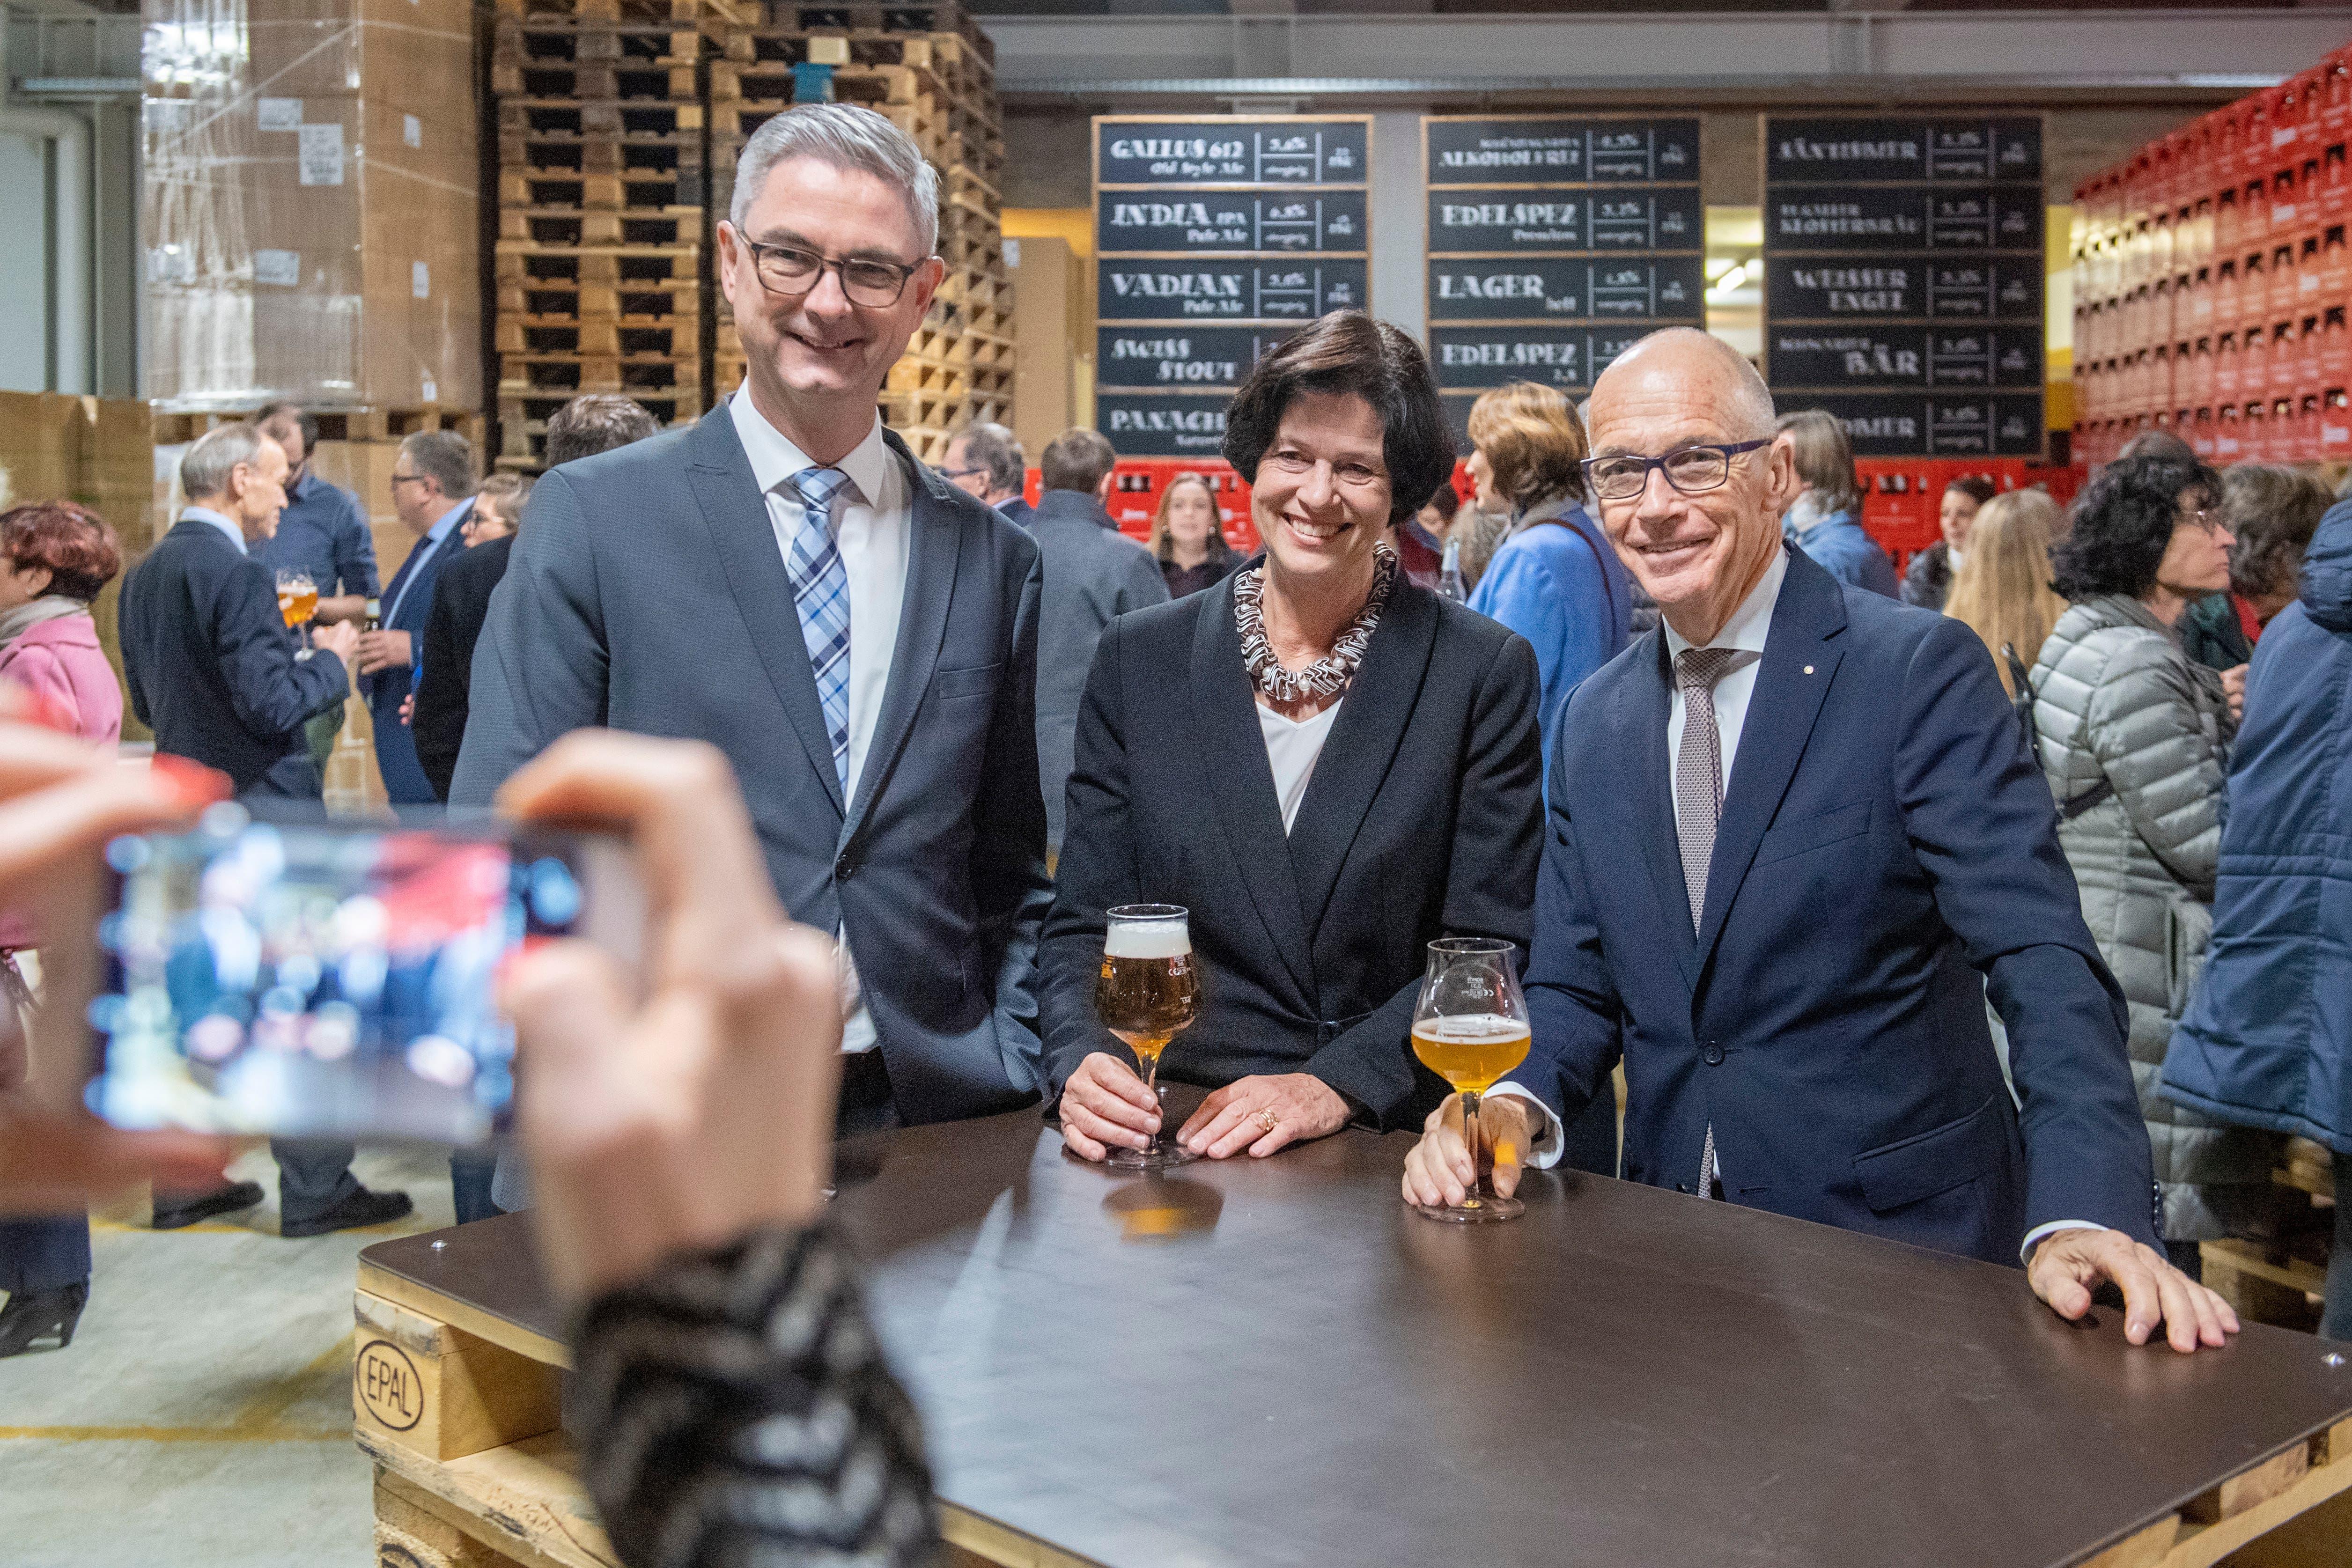 Von links: Vize-Parlamentspräsident Beat Rütsche, Parlamentspräsidentin Barbara Frei, Stadtpräsident Thomas Scheitlin. (Bild: Urs Bucher, 15. Januar 2019)